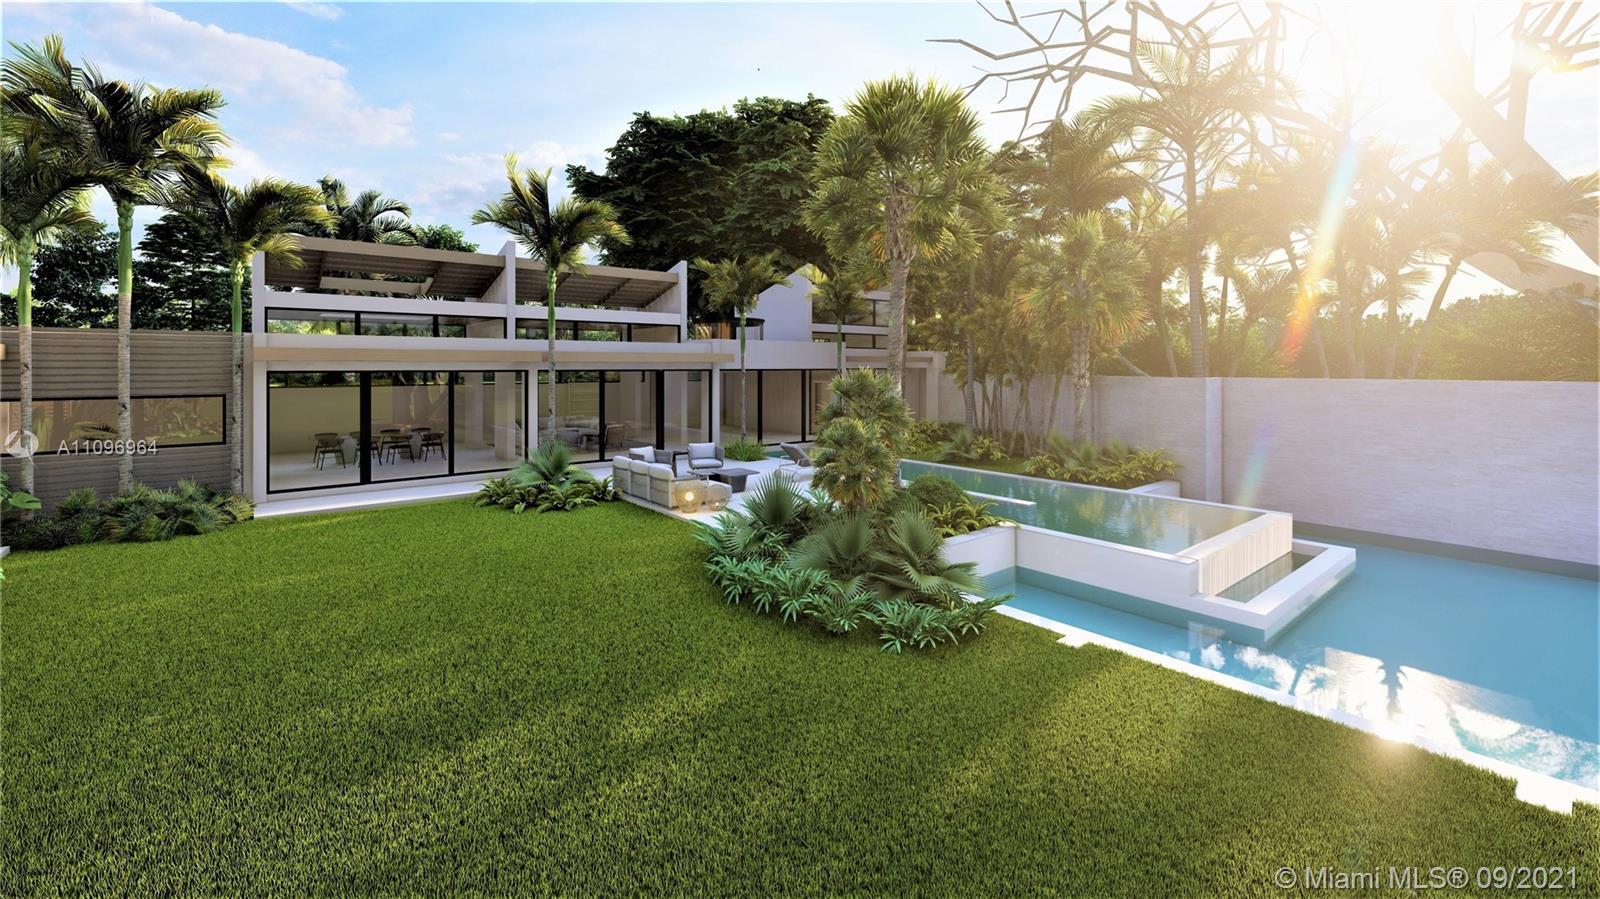 3651 Saint Gaudens Rd Luxury Real Estate